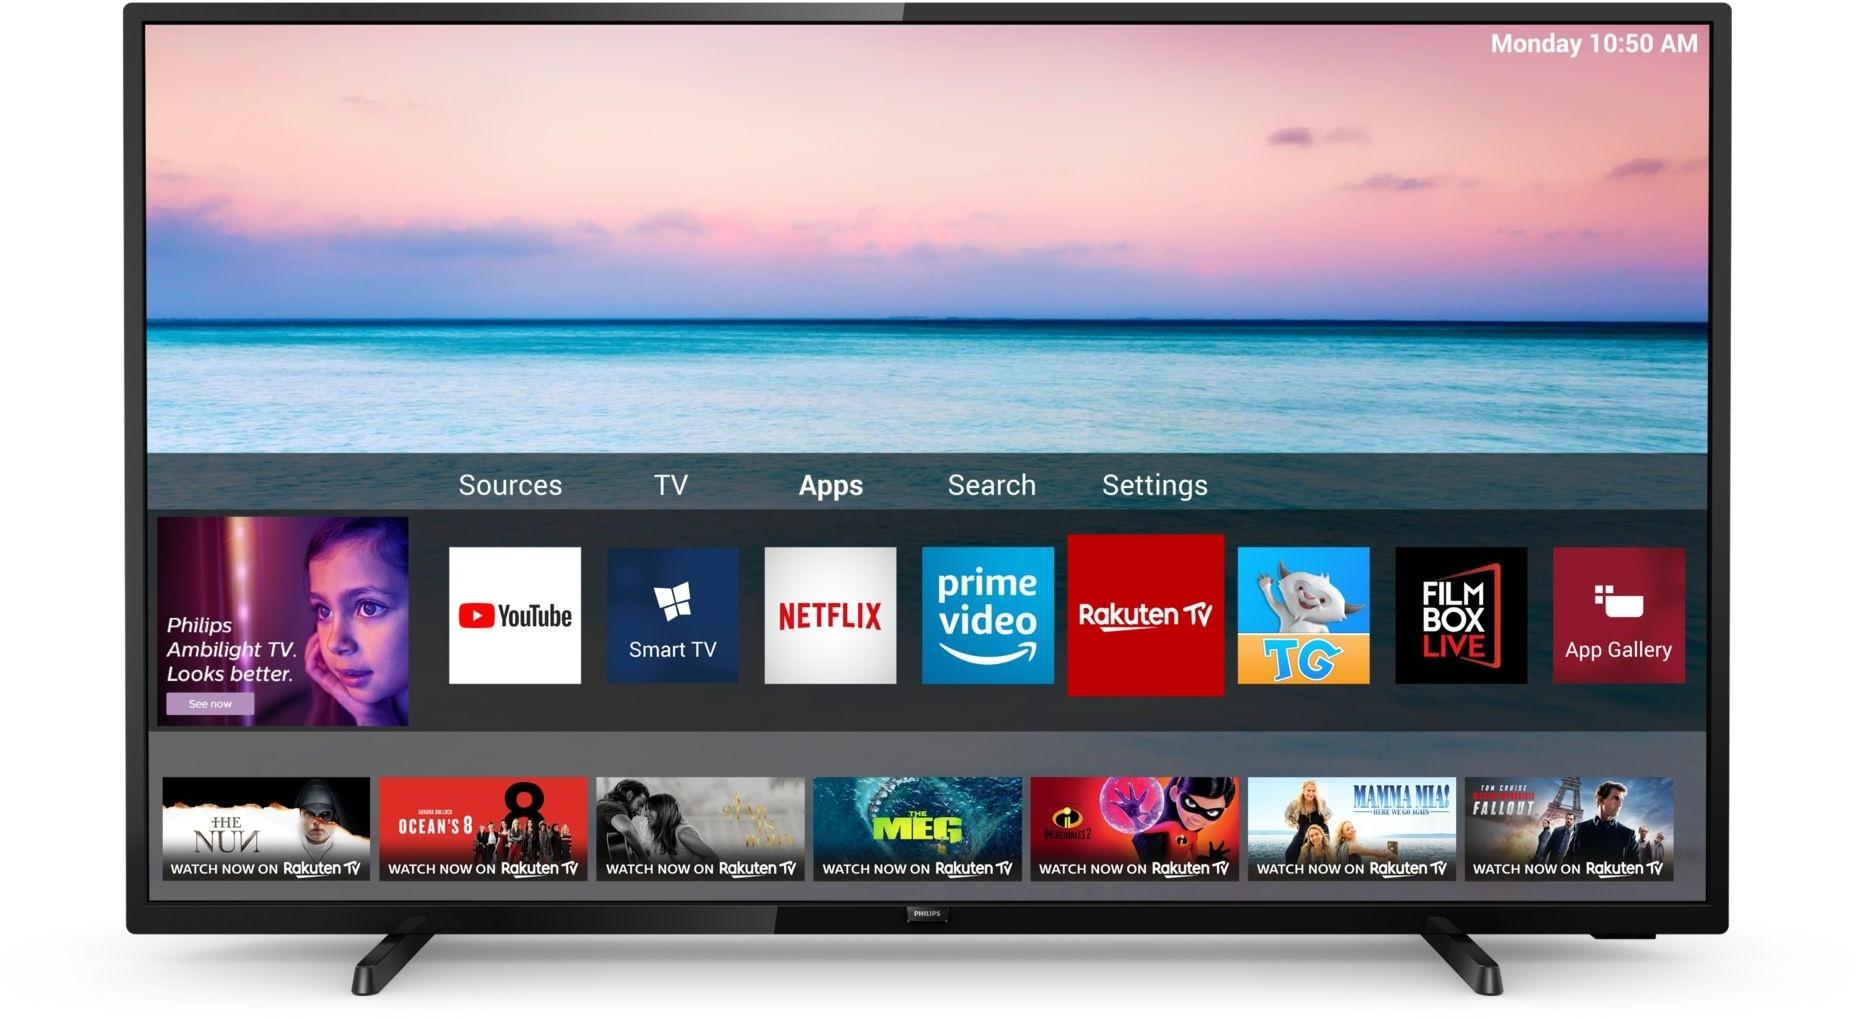 PHILIPS Philips 58PUS6504/12 - 4K TV 58 inch (147 cm) Smart TV